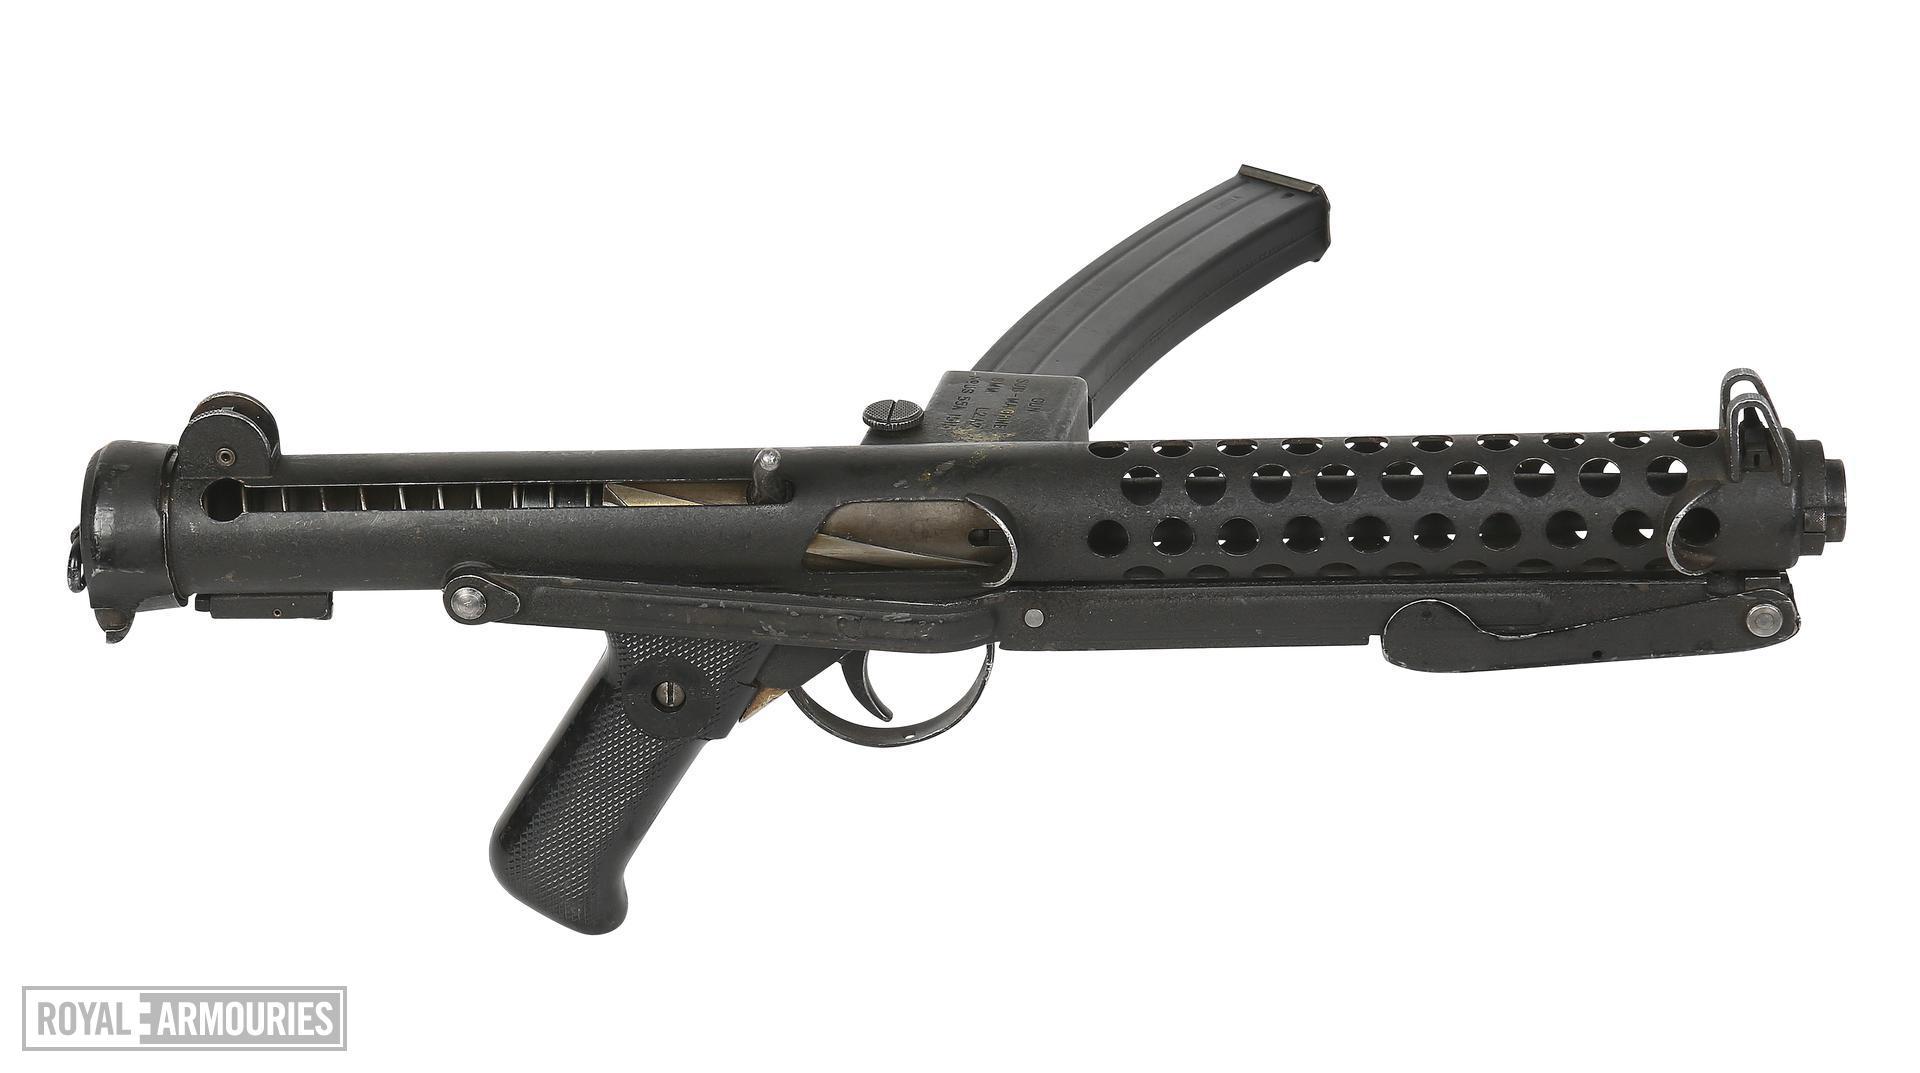 Centrefire automatic submachine gun - Sterling L2A2